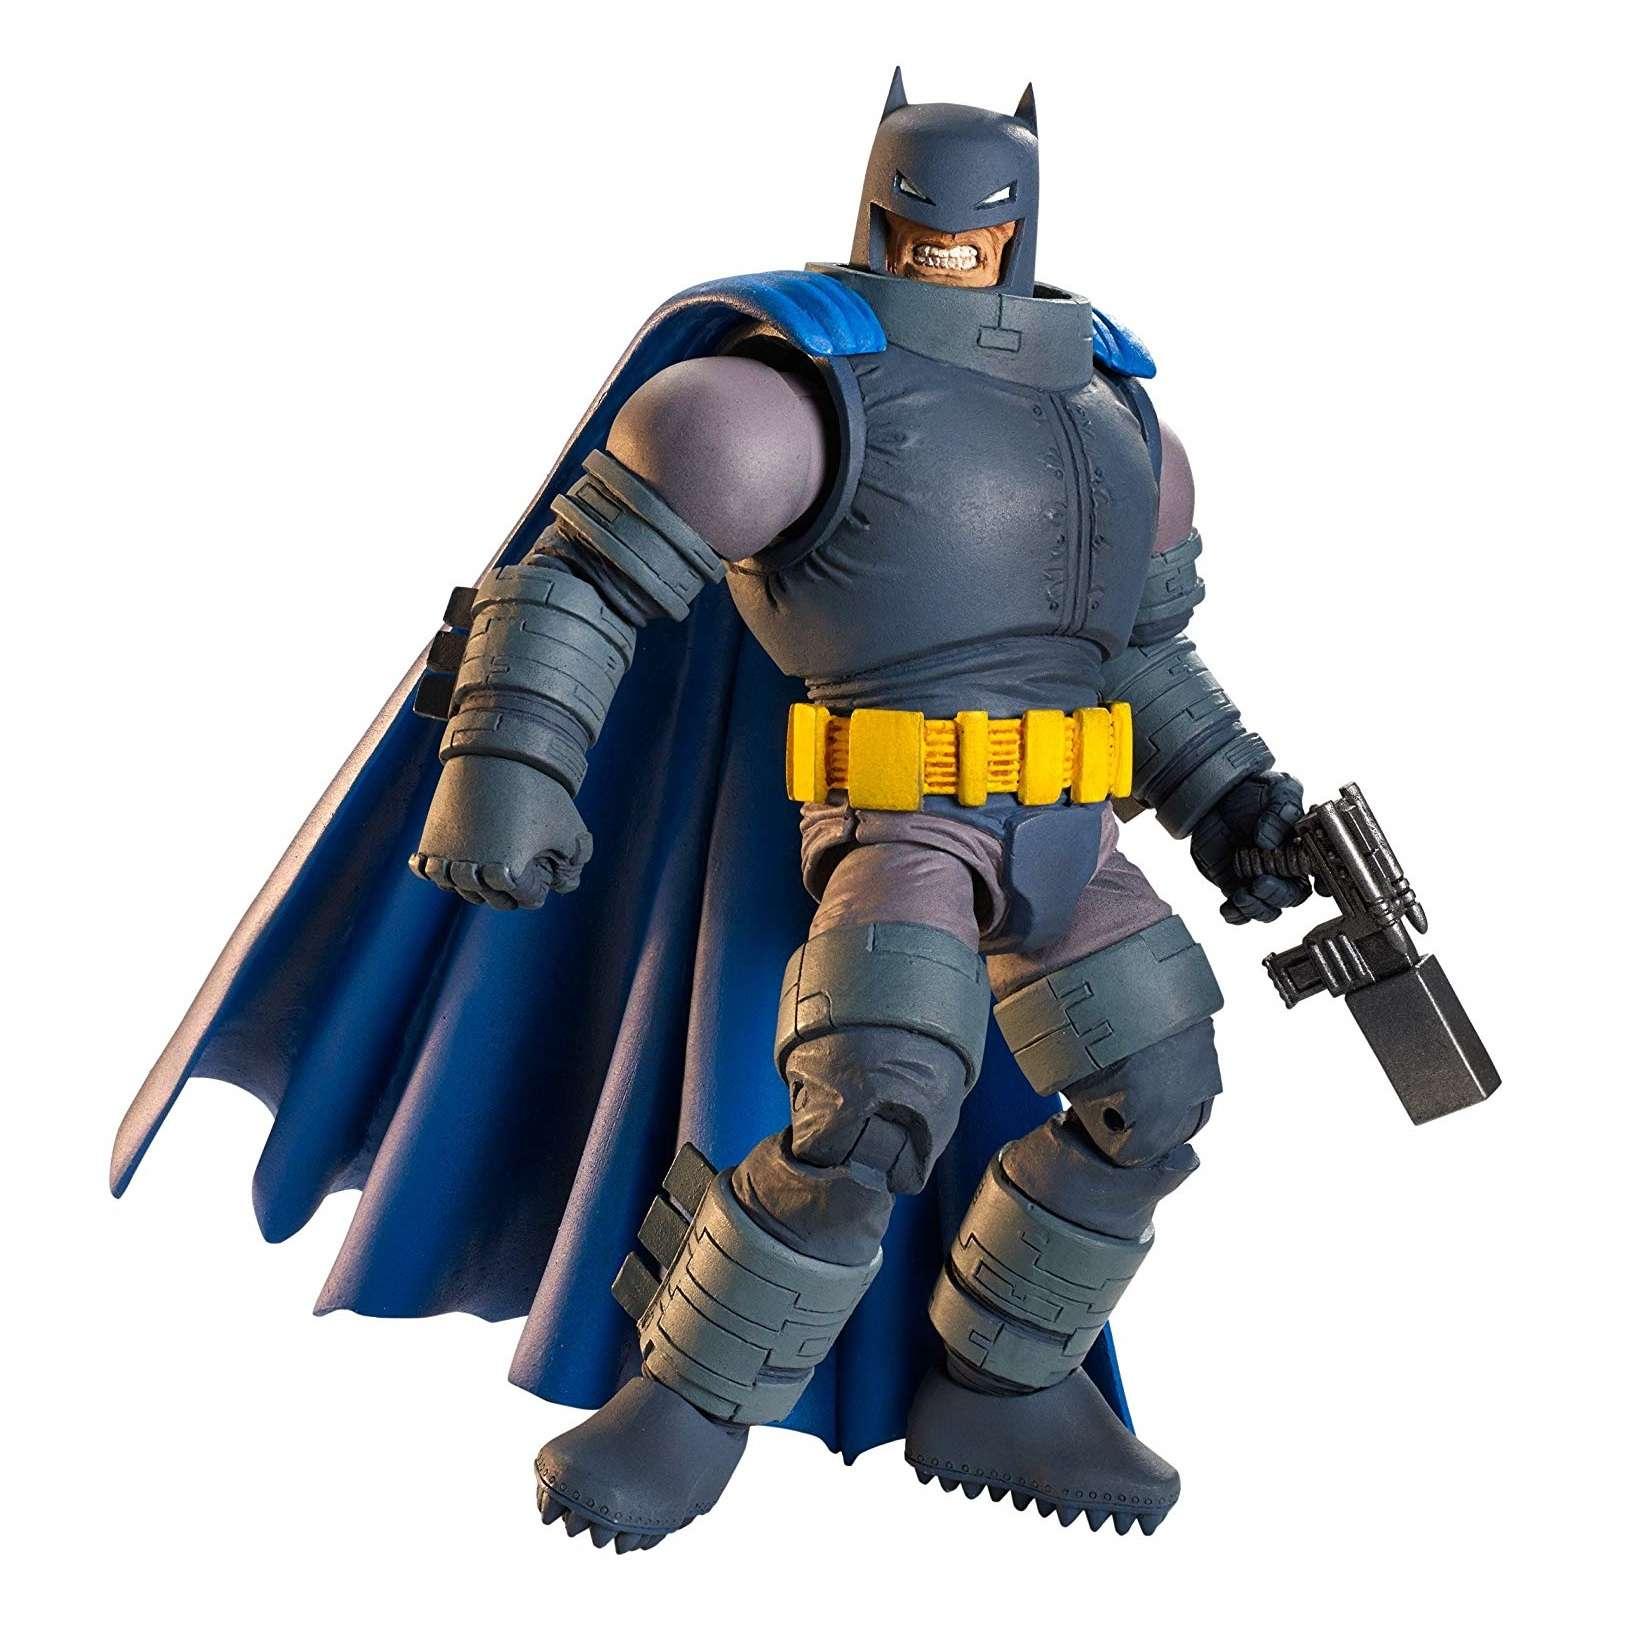 Action Figure: The Dark Knight Returns - Armored Batman Photo